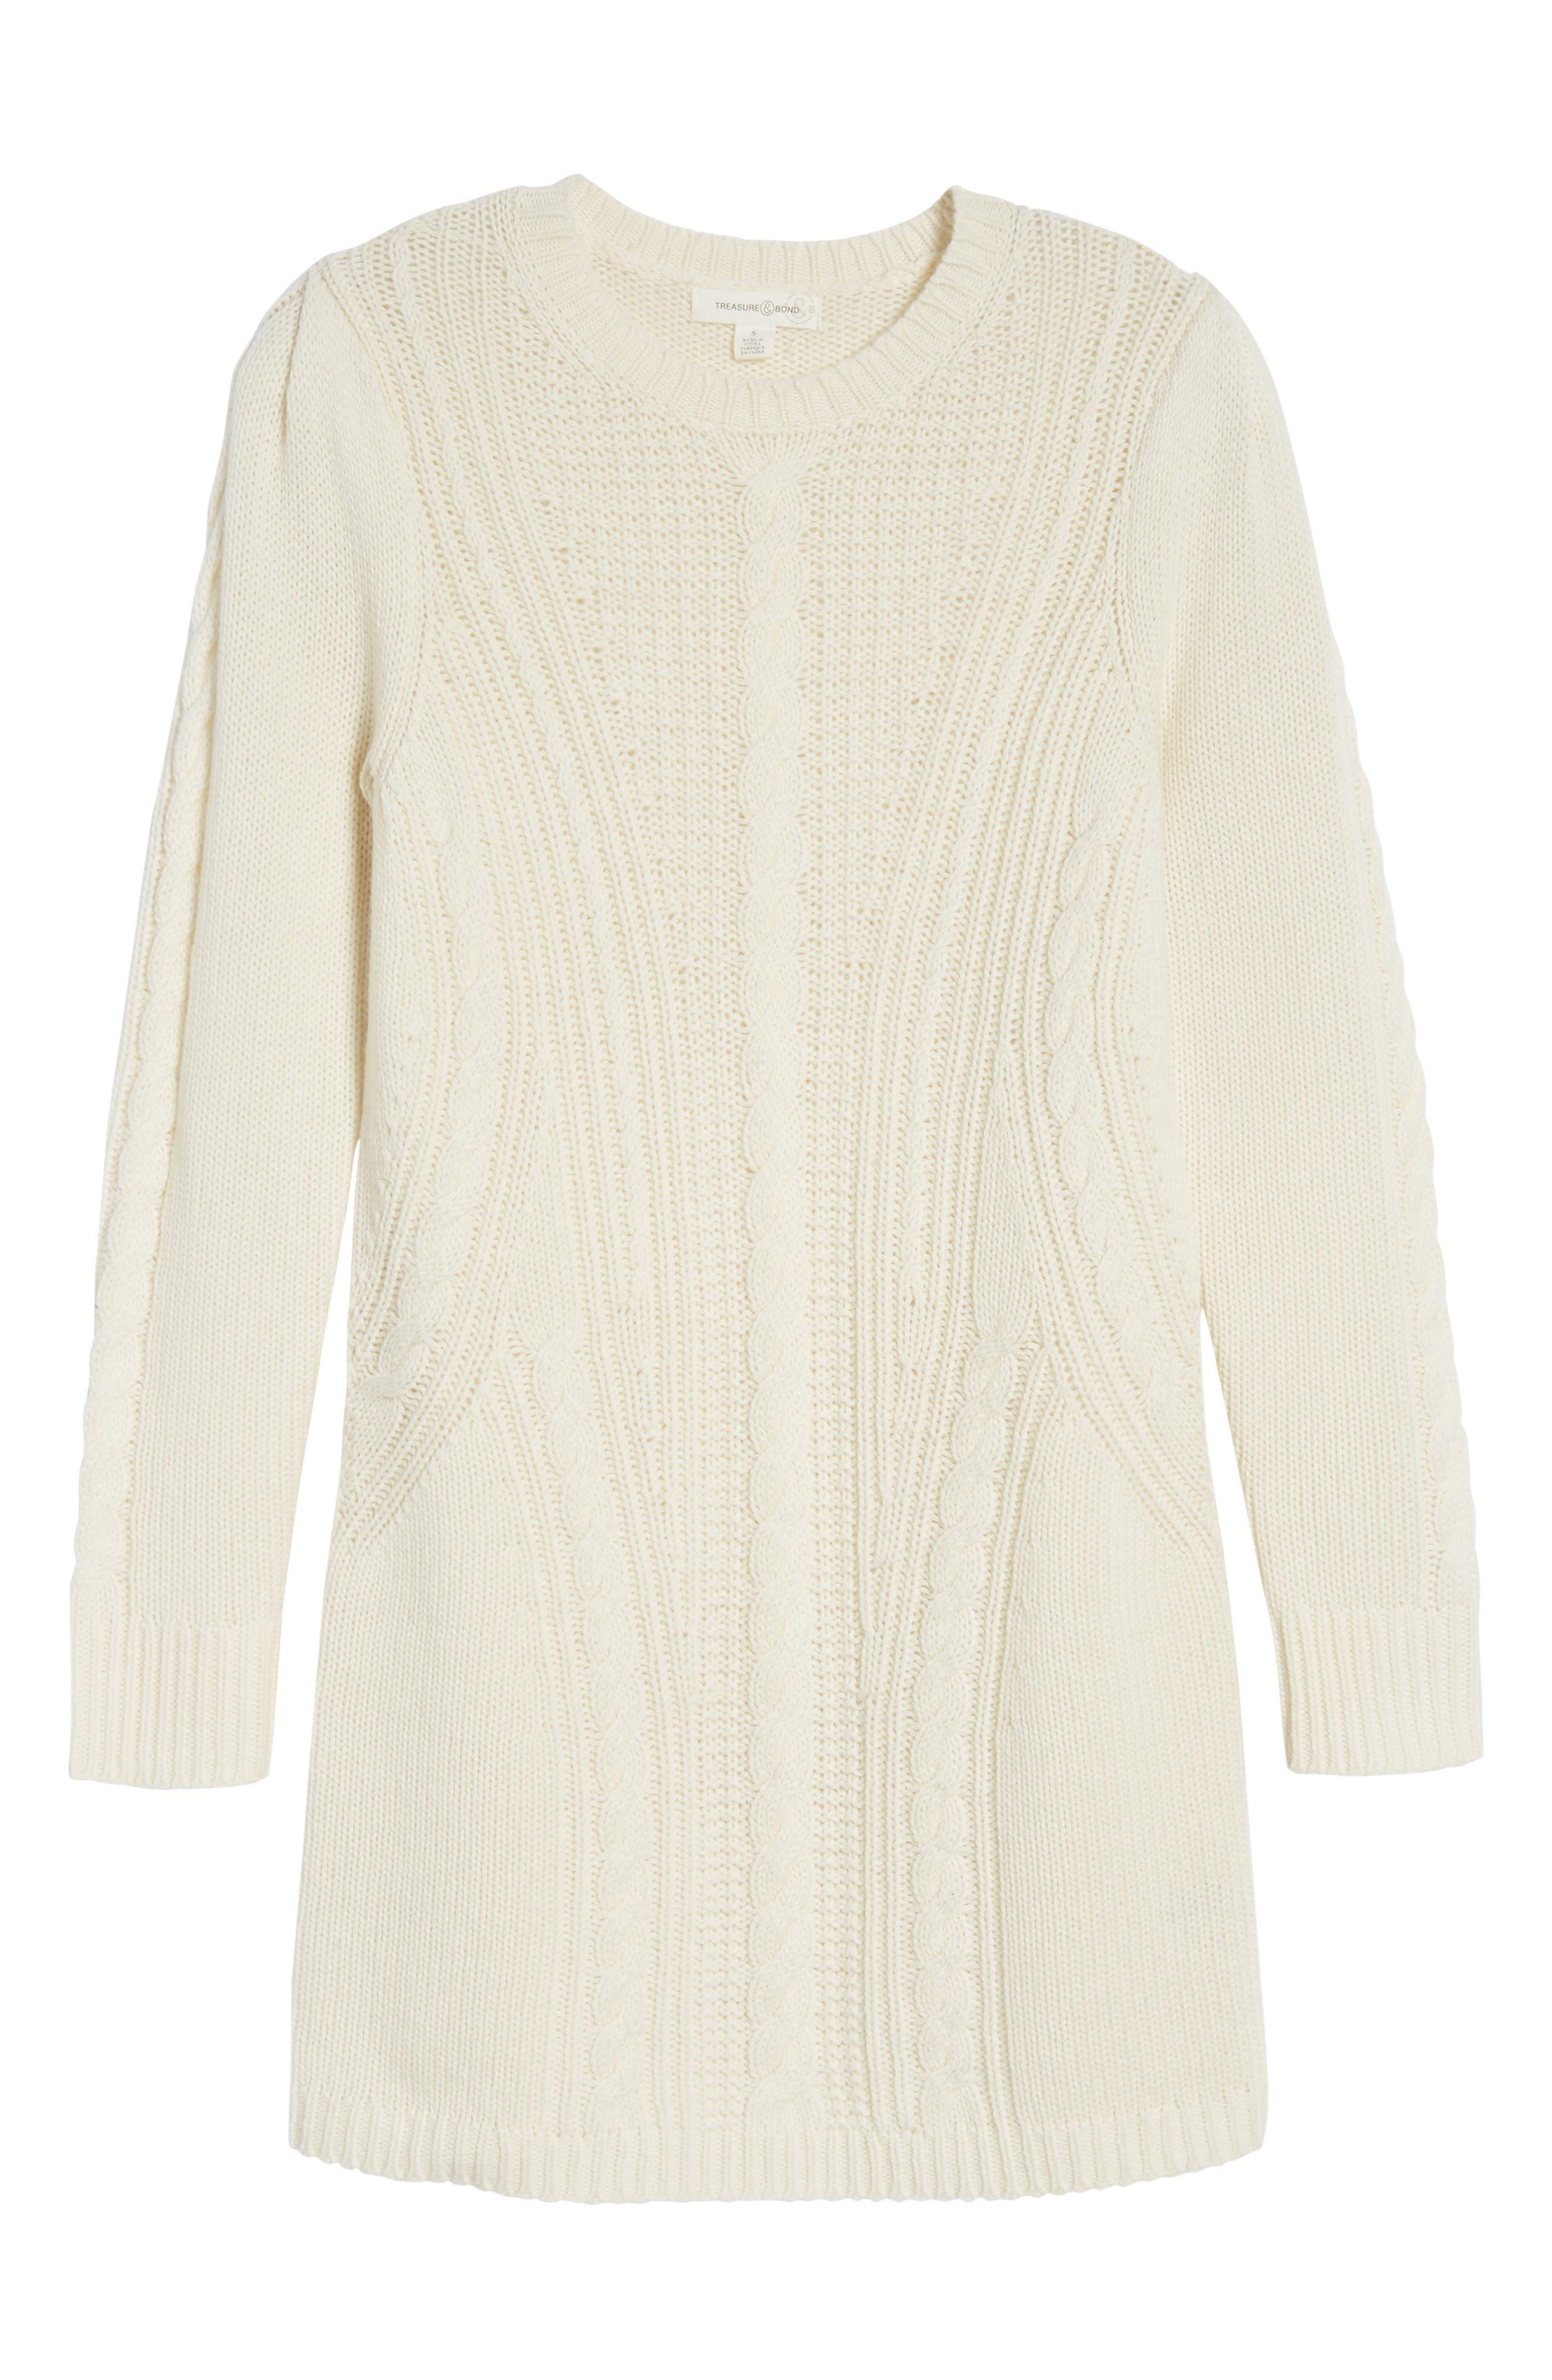 x Something Navy Sweater Dress,                             Alternate thumbnail 6, color,                             101